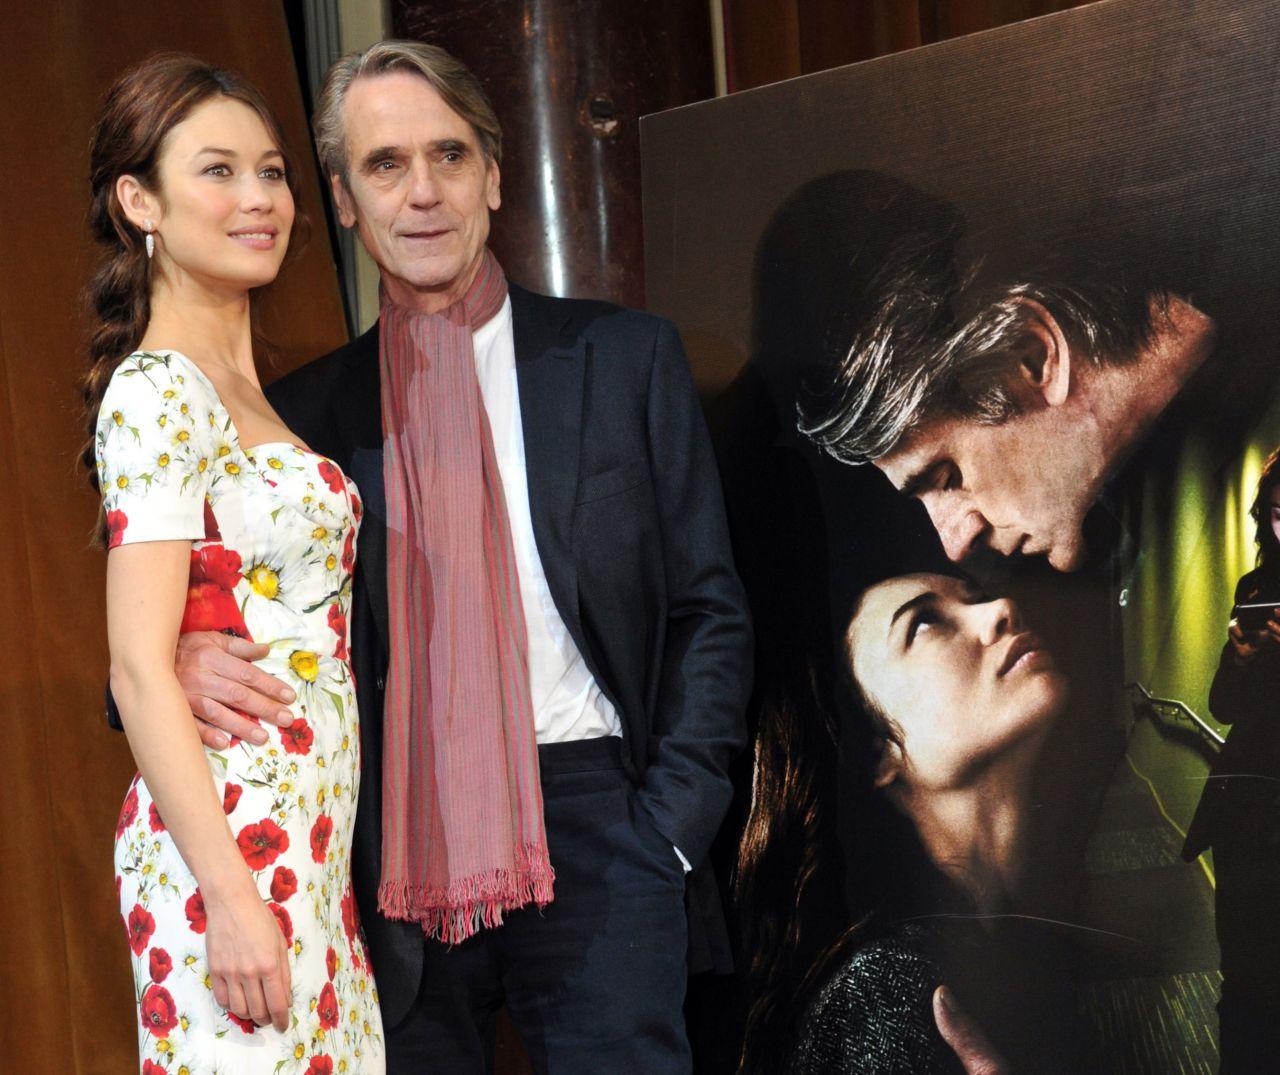 Anne Hathaway Graham Norton: 'La Corrispondenza' Photocall In Rome